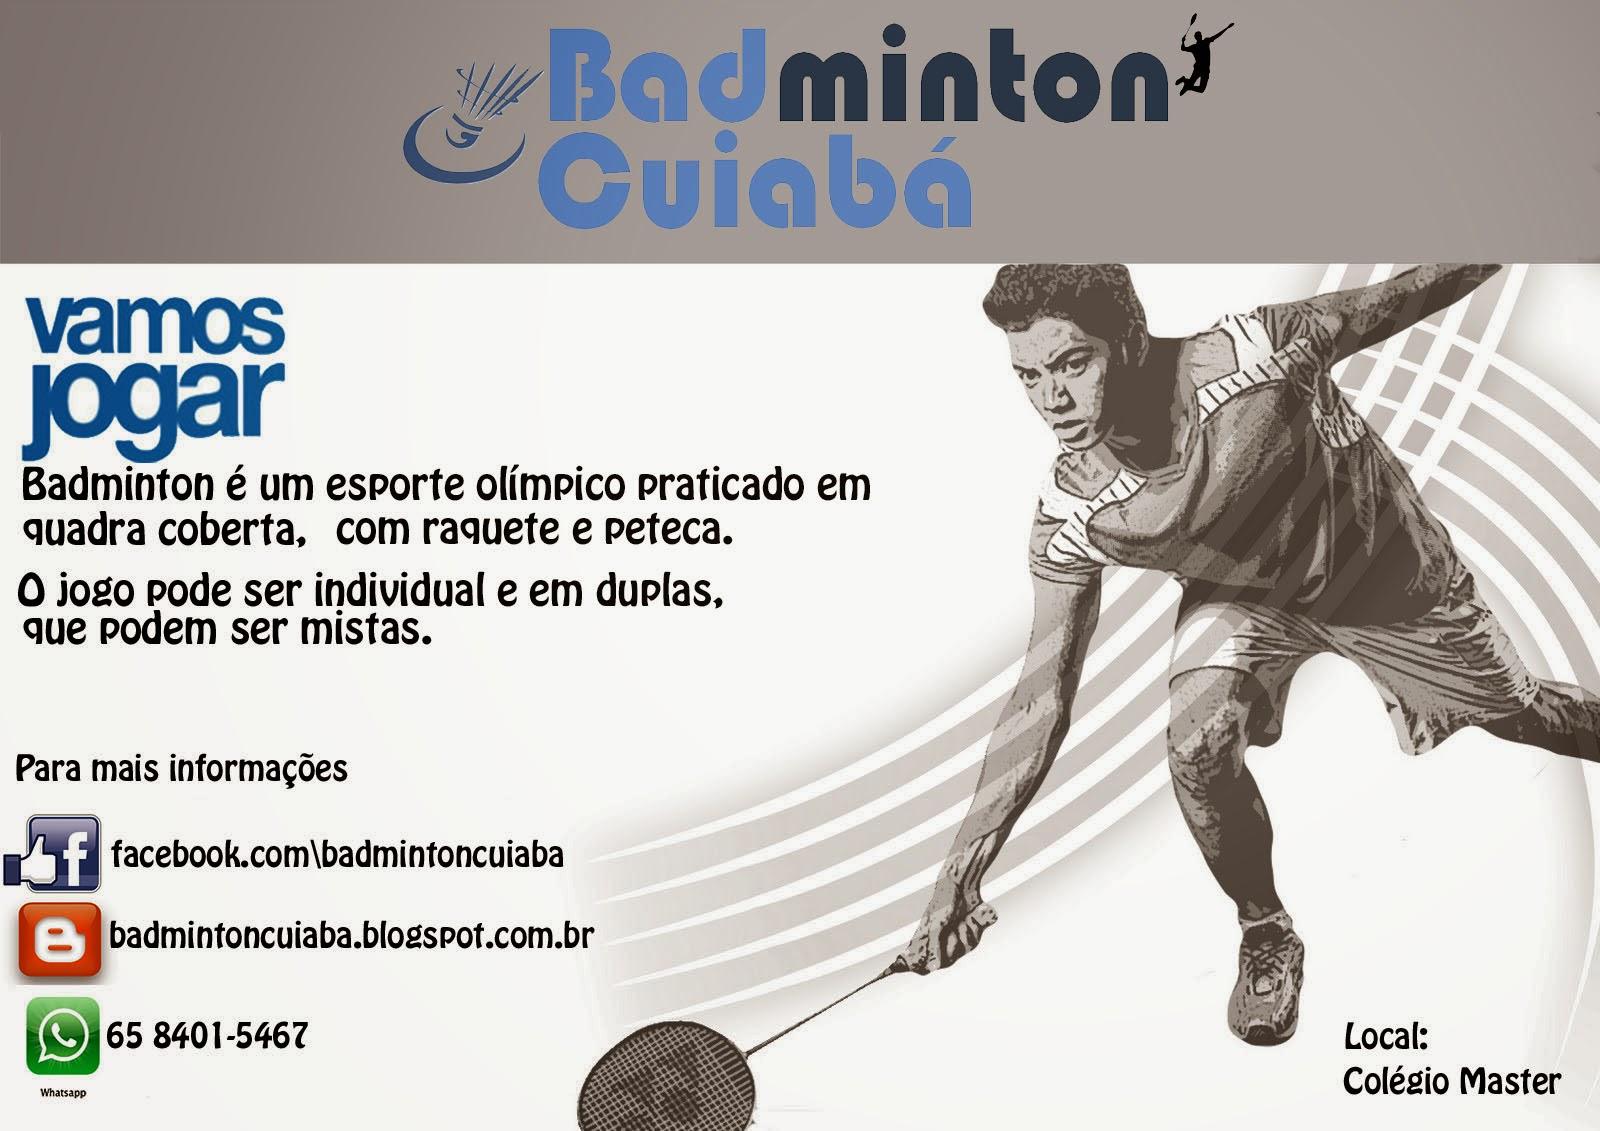 Badminton Cuiabá